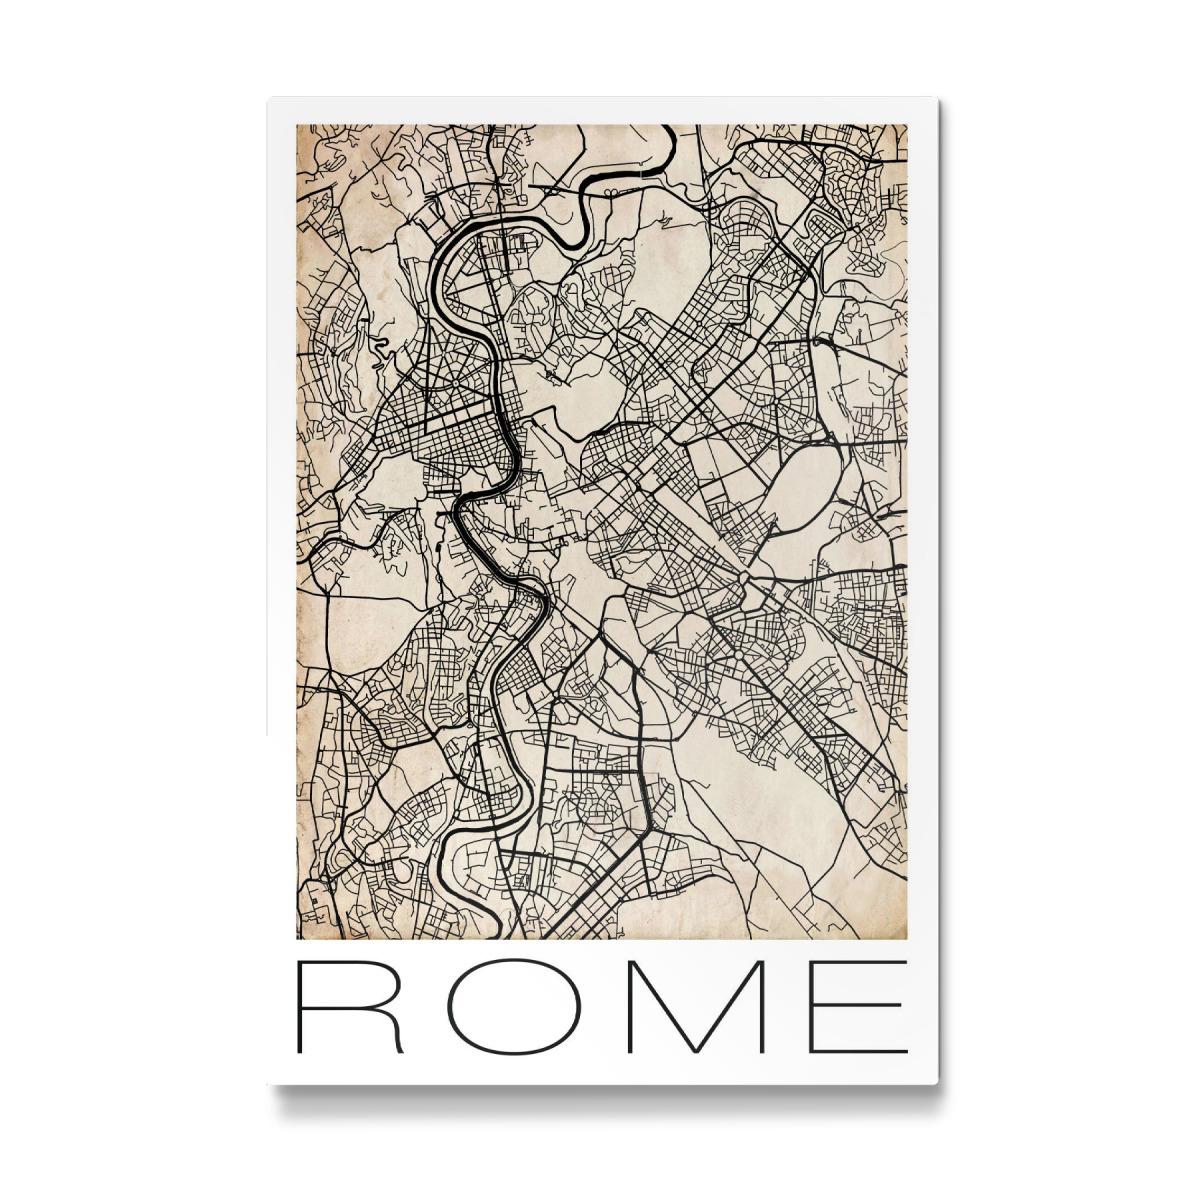 Retro City Map Rome als Galerie-Print bei artboxONE kaufen